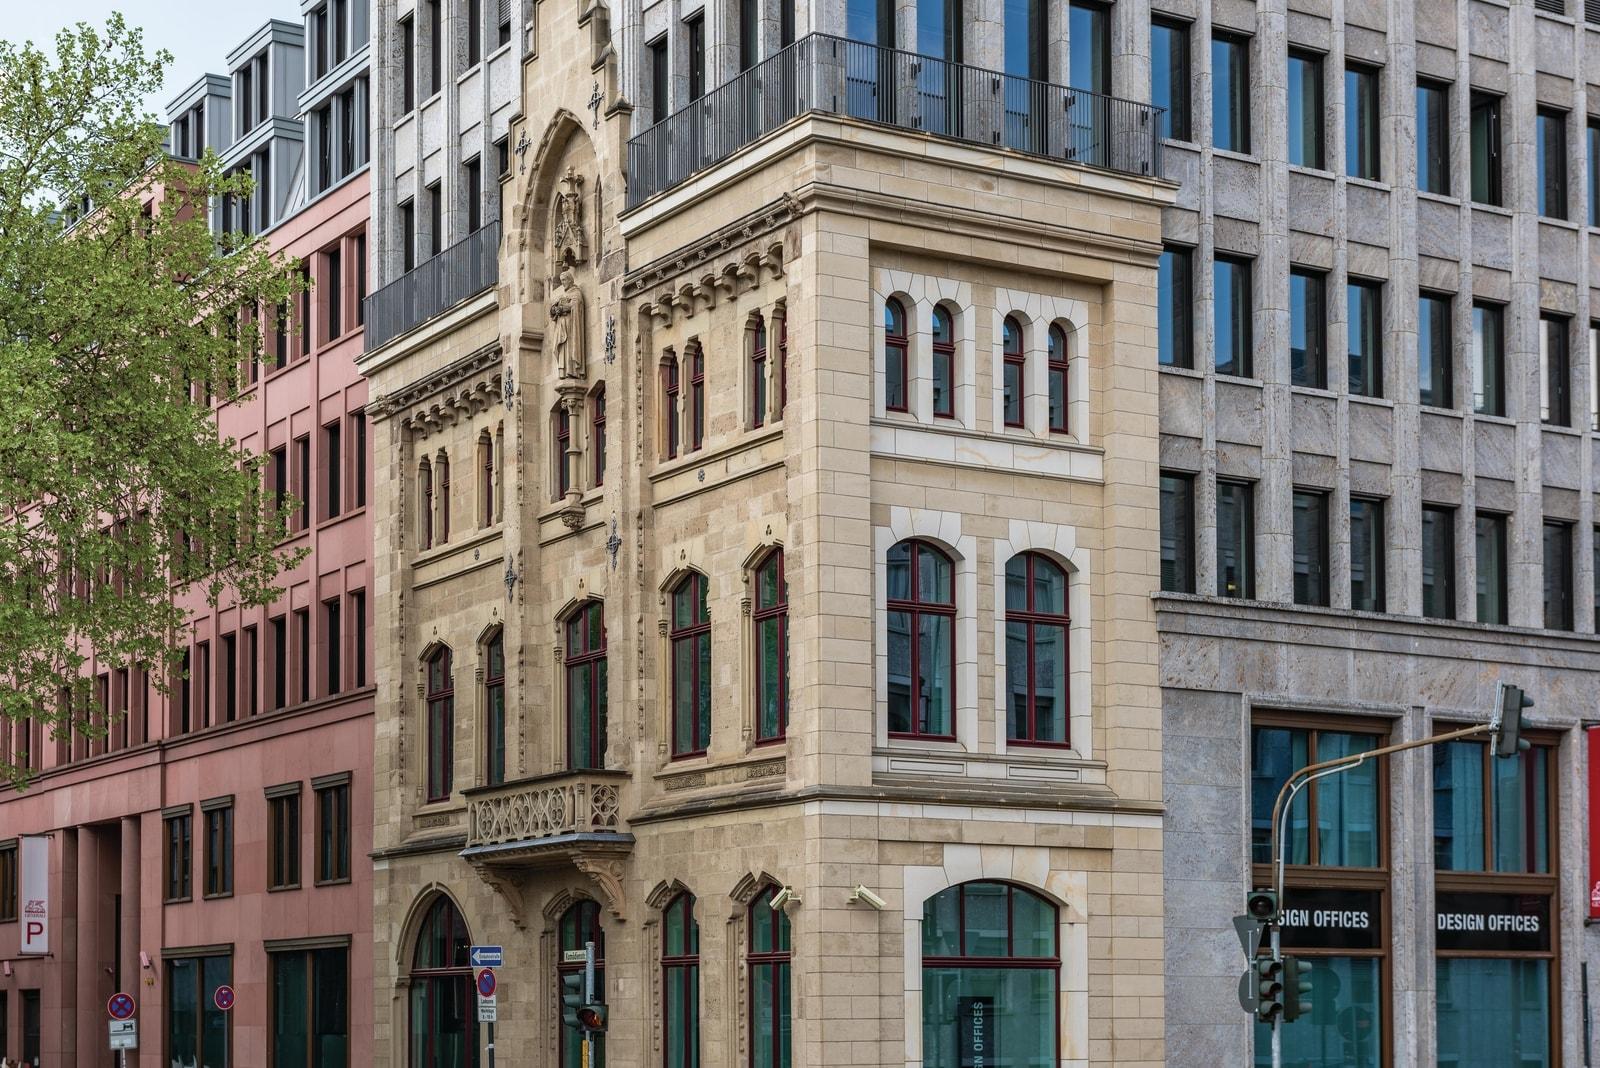 tunisstraße building